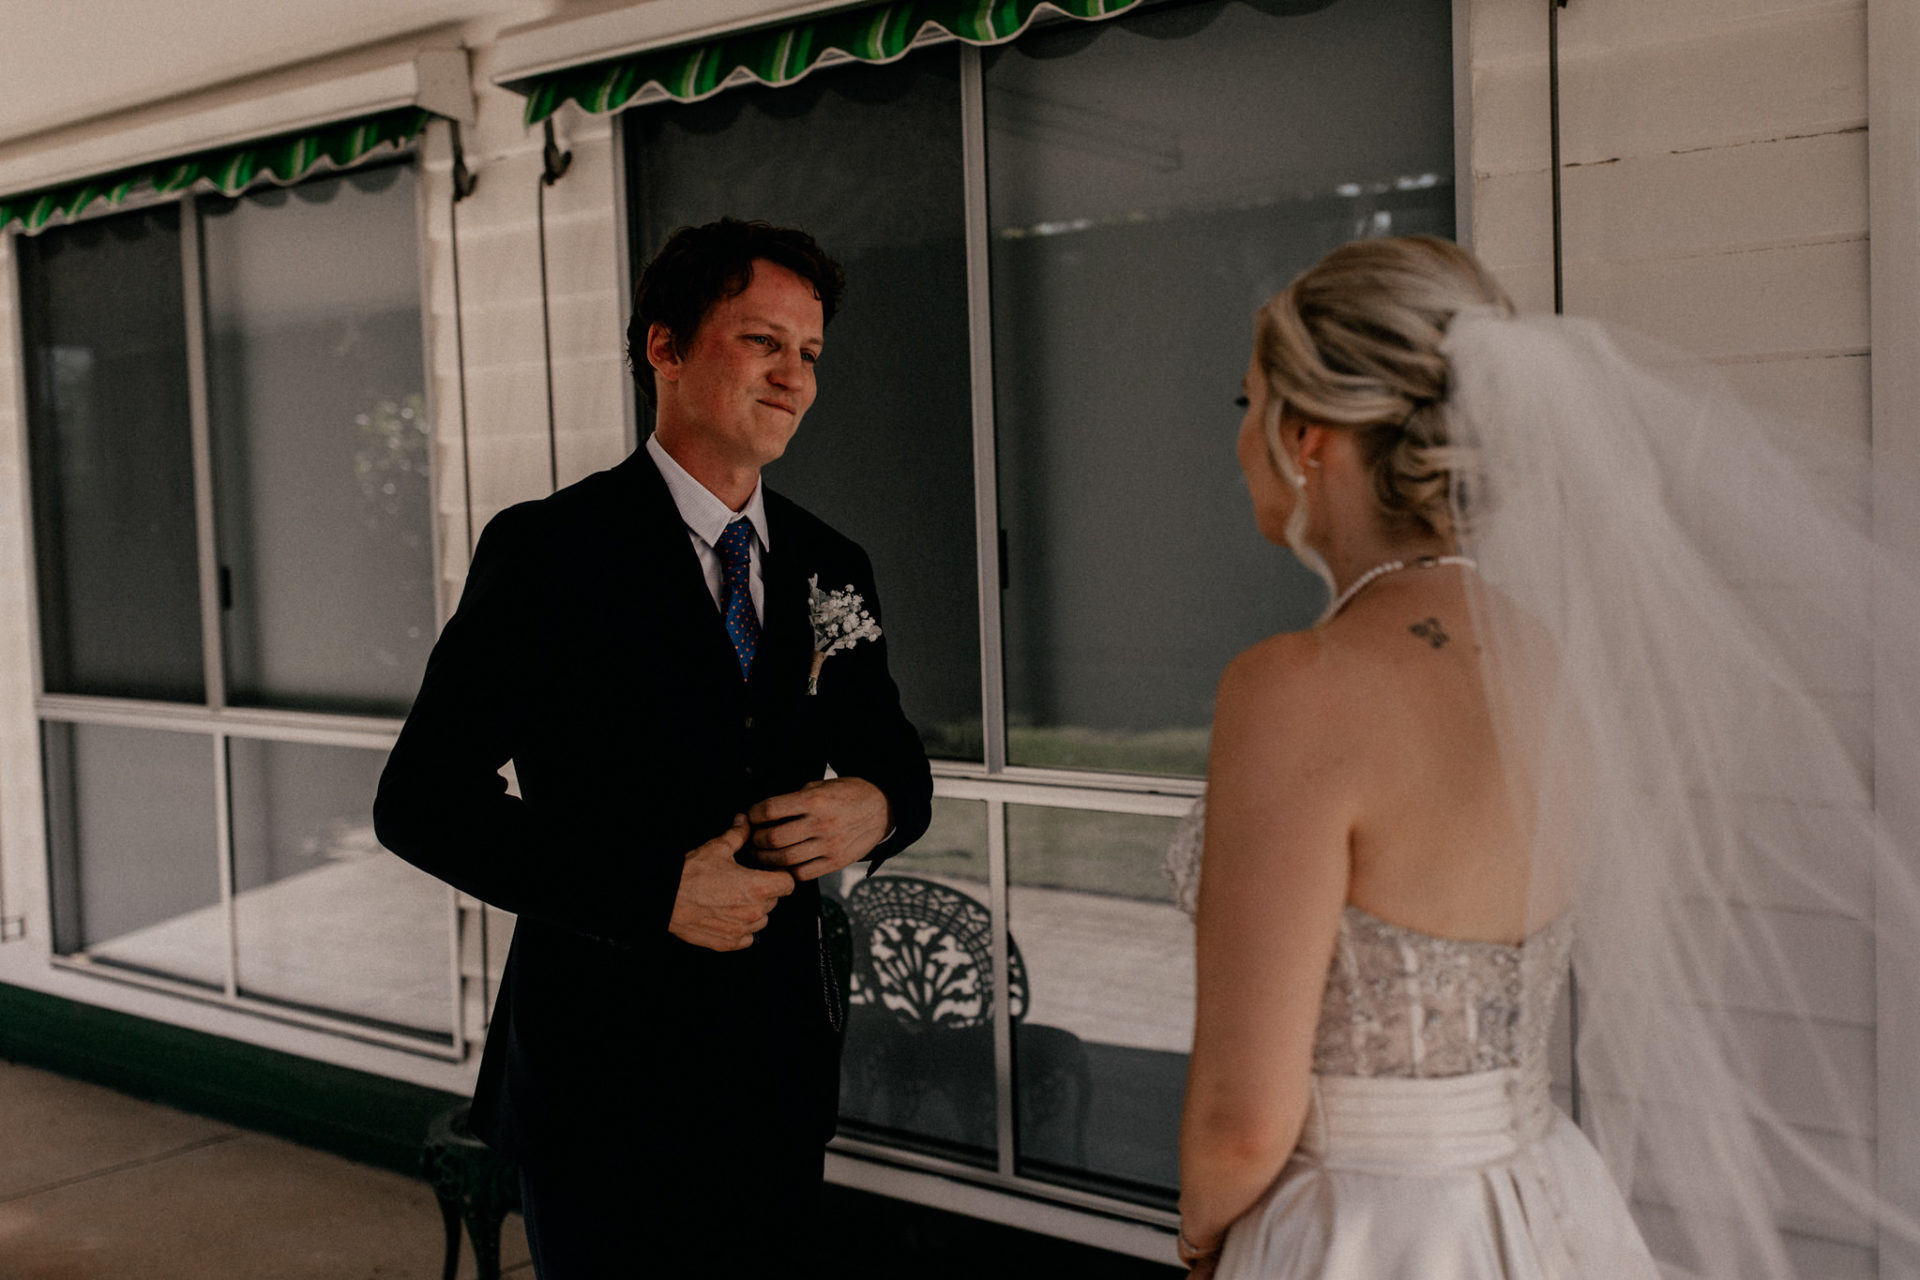 backyard-wedding-australia-melbourne-bride-groom-first-look-dancing-intimate-hug-veil-blue-suit